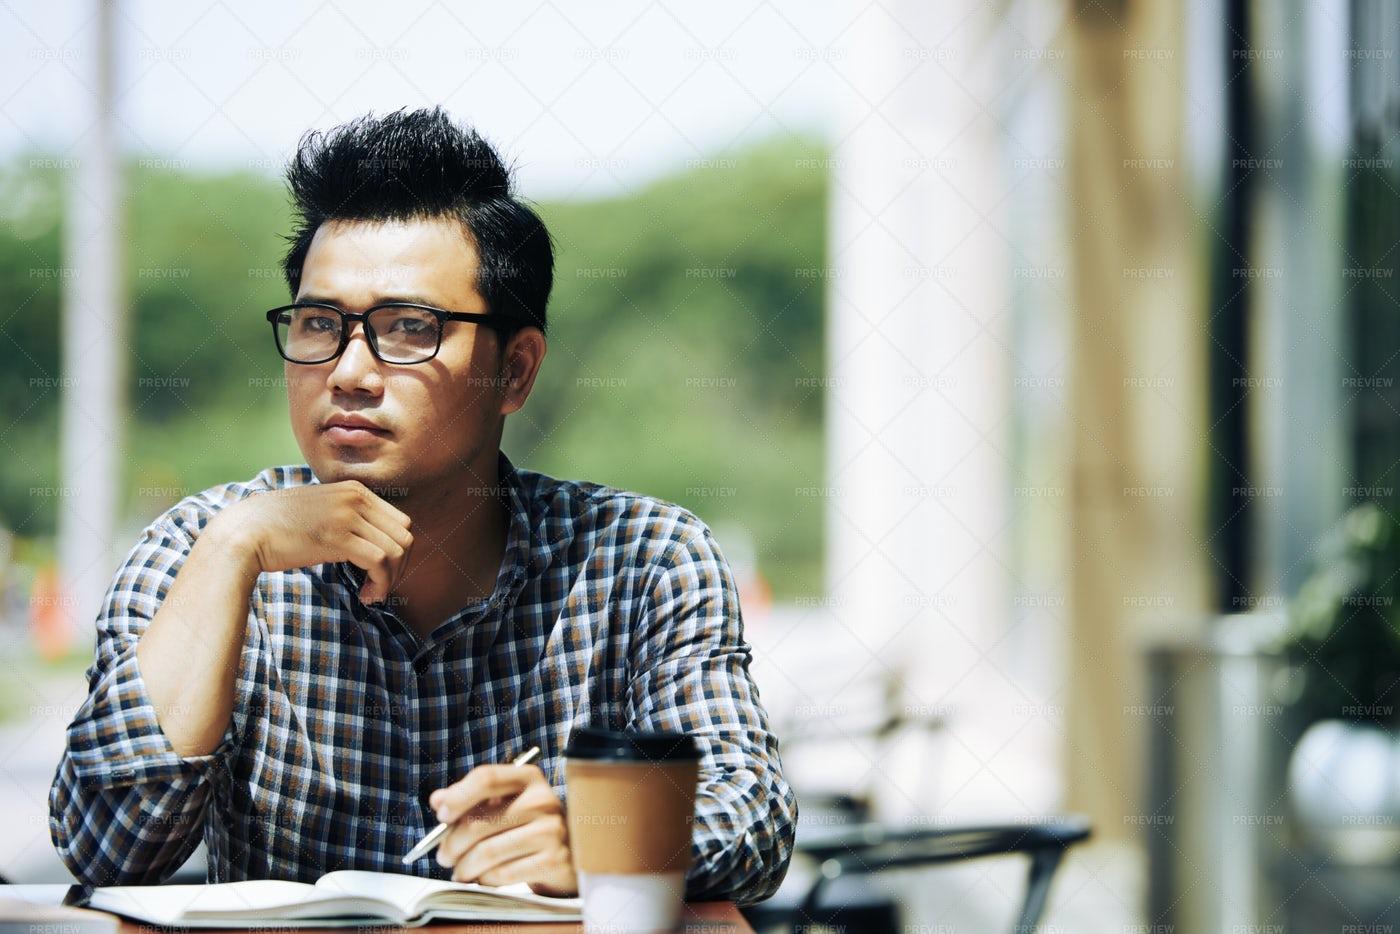 Pensive Creative Student: Stock Photos